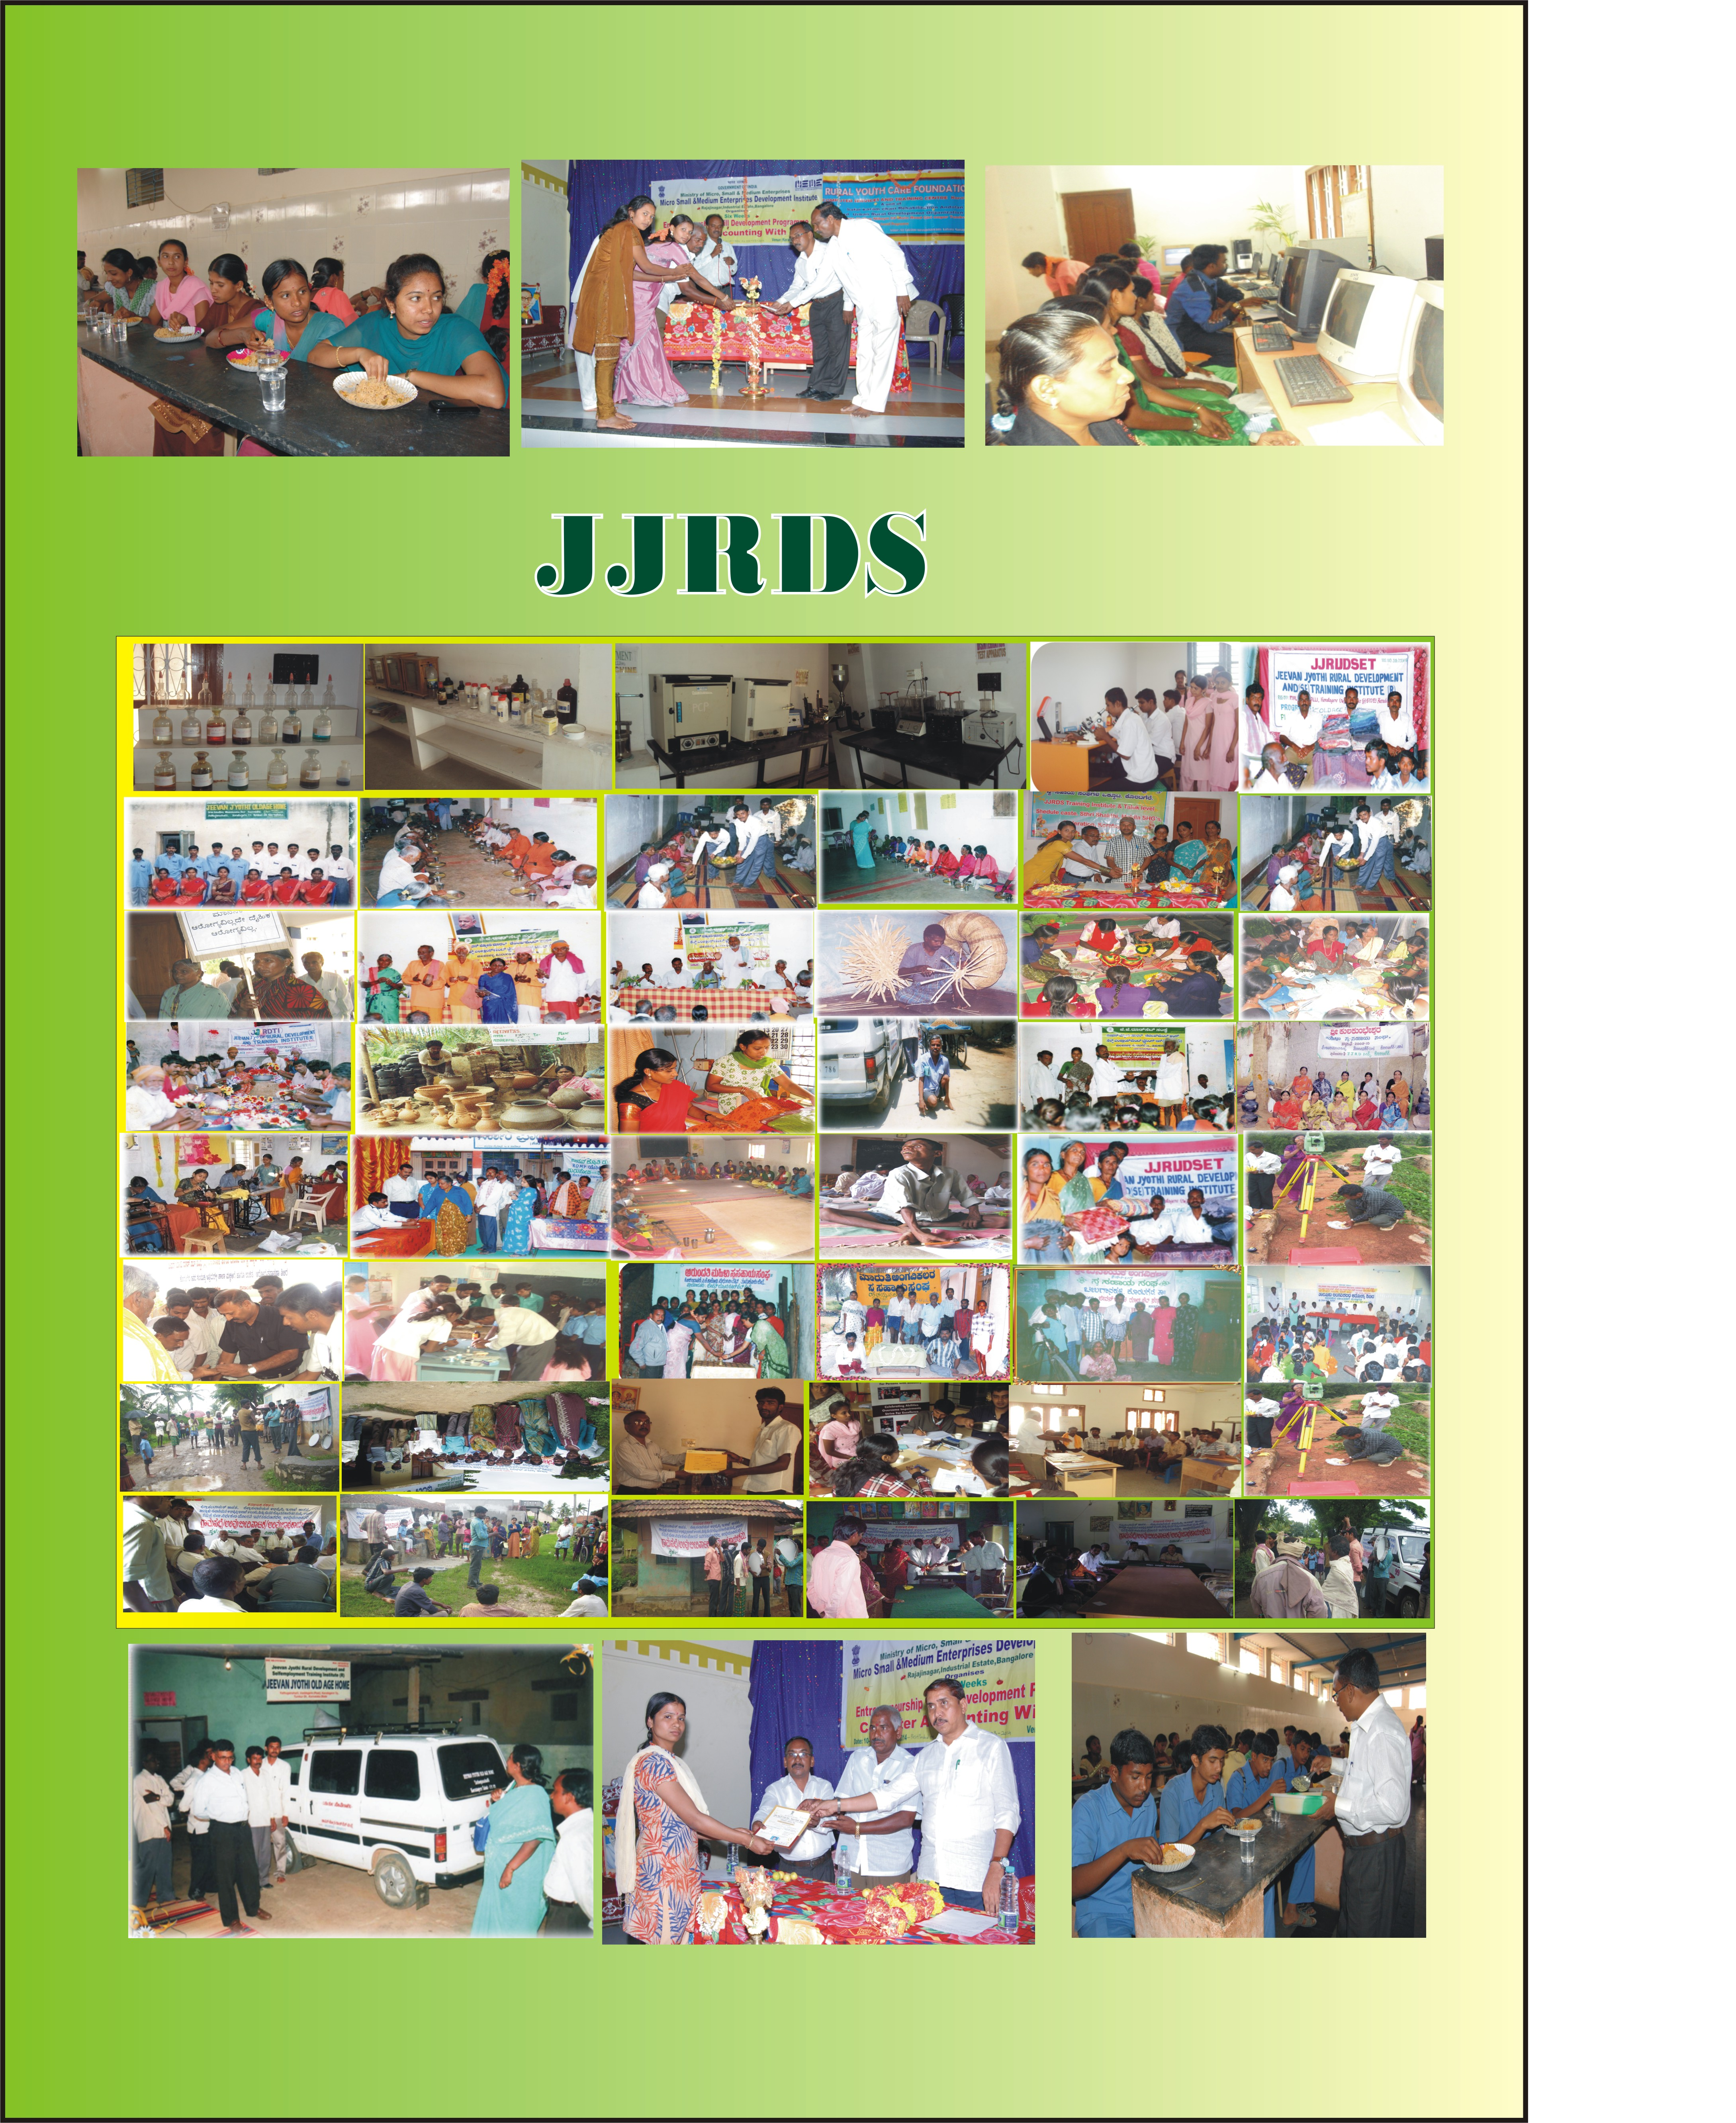 /media/jjrdseti/jjrds_back_2_-_Copy.jpg